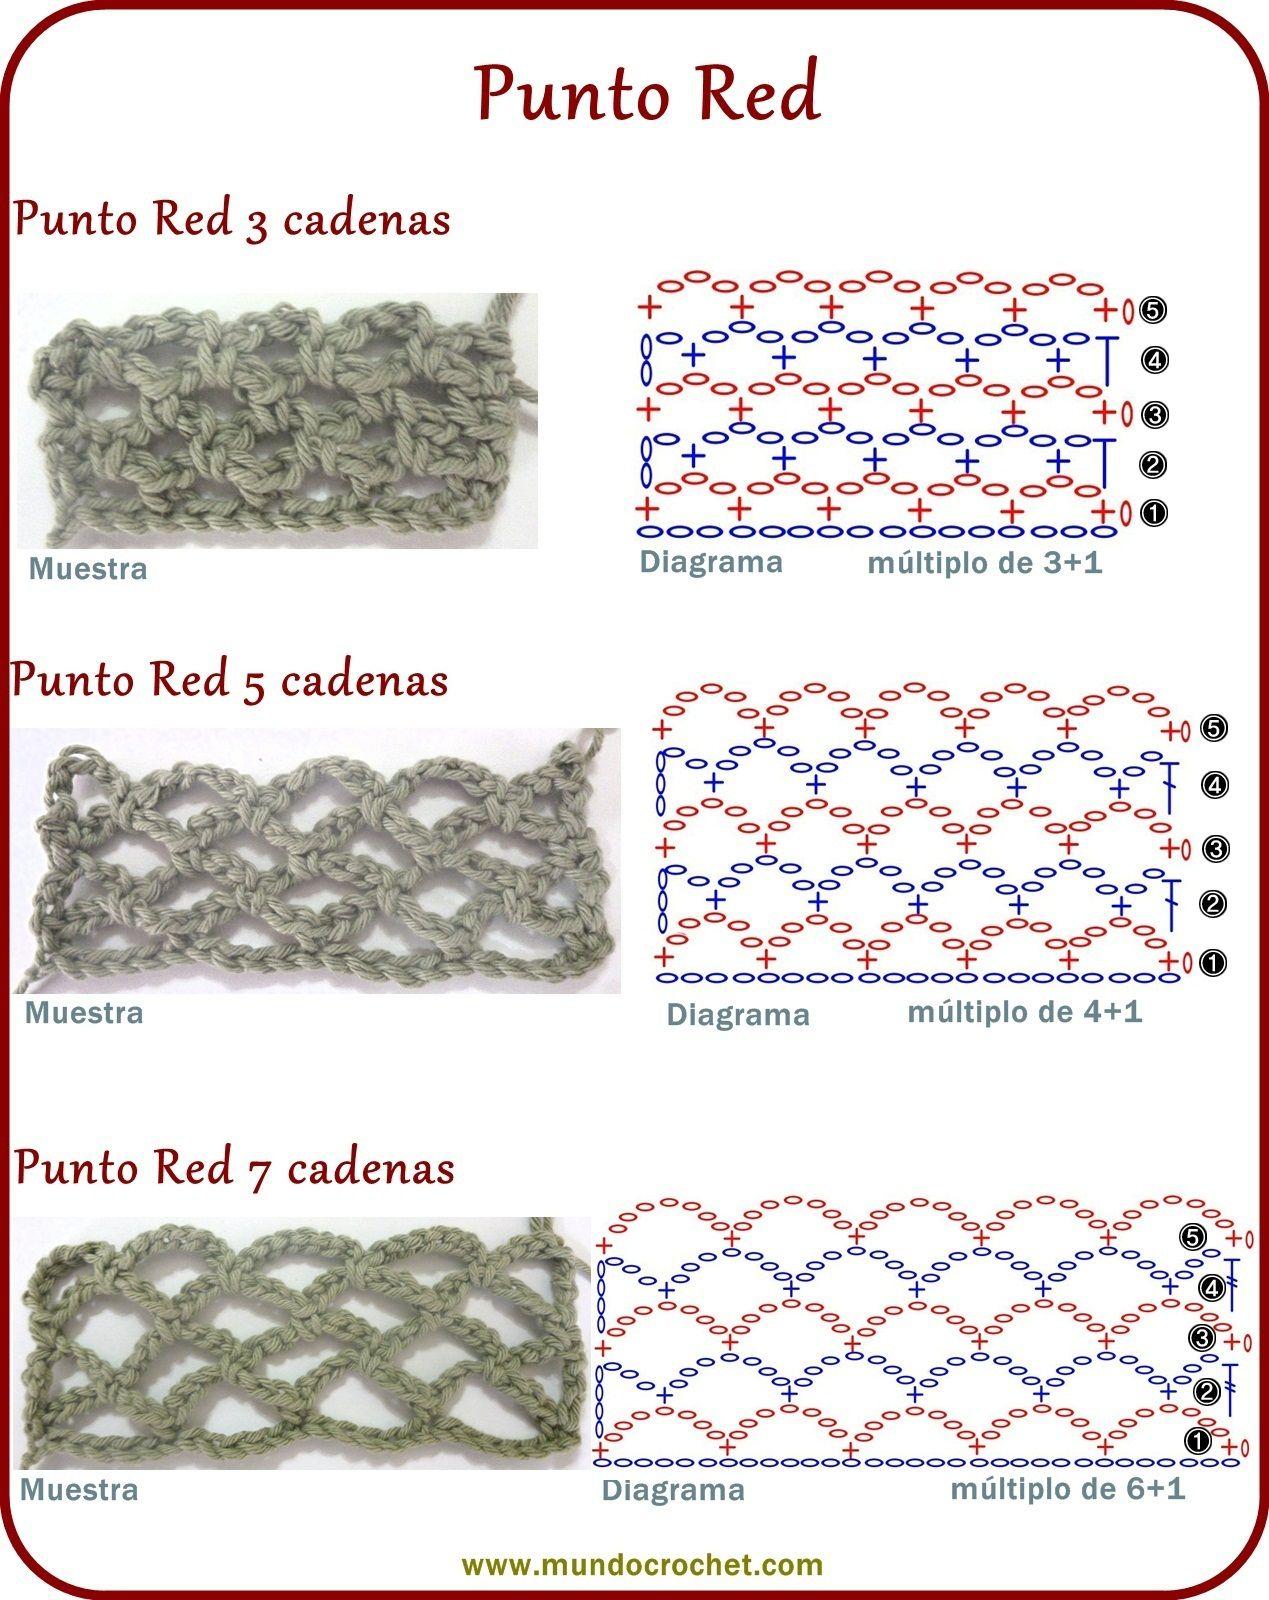 52-Punto red recto | Tutoriales crochet 1 | Pinterest | Dreieckstuch ...